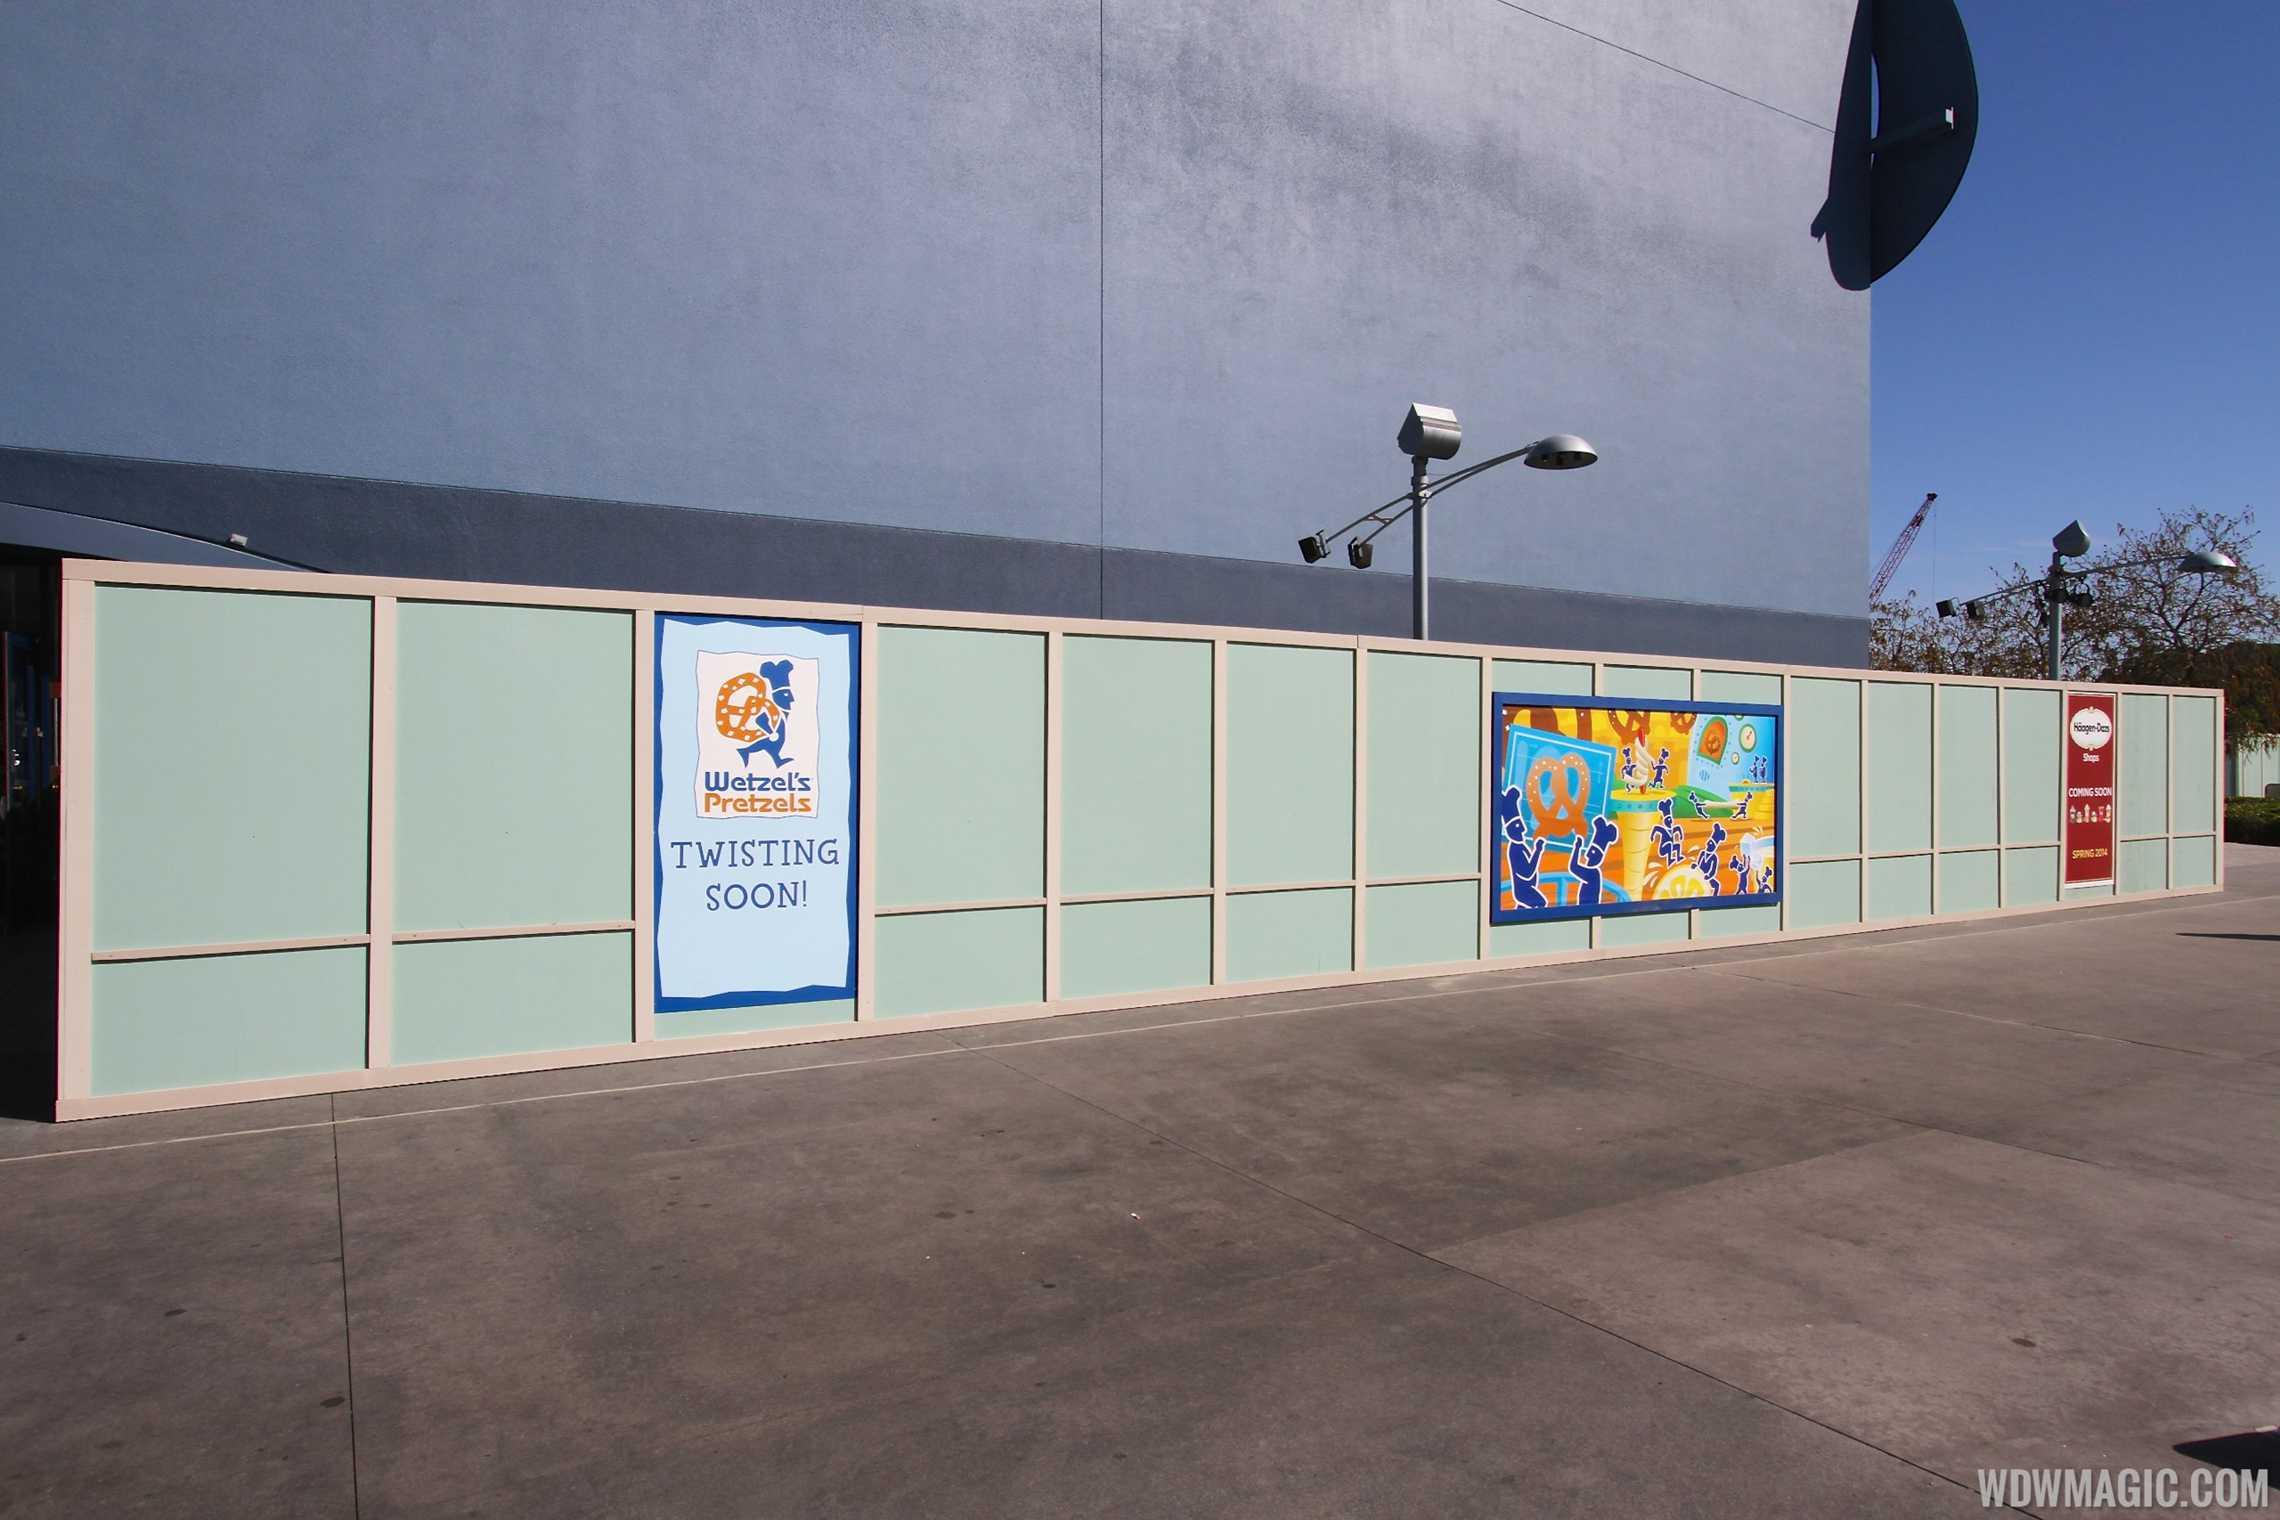 Wetzel's Pretzels and Haagen Dazs kiosks now under construction